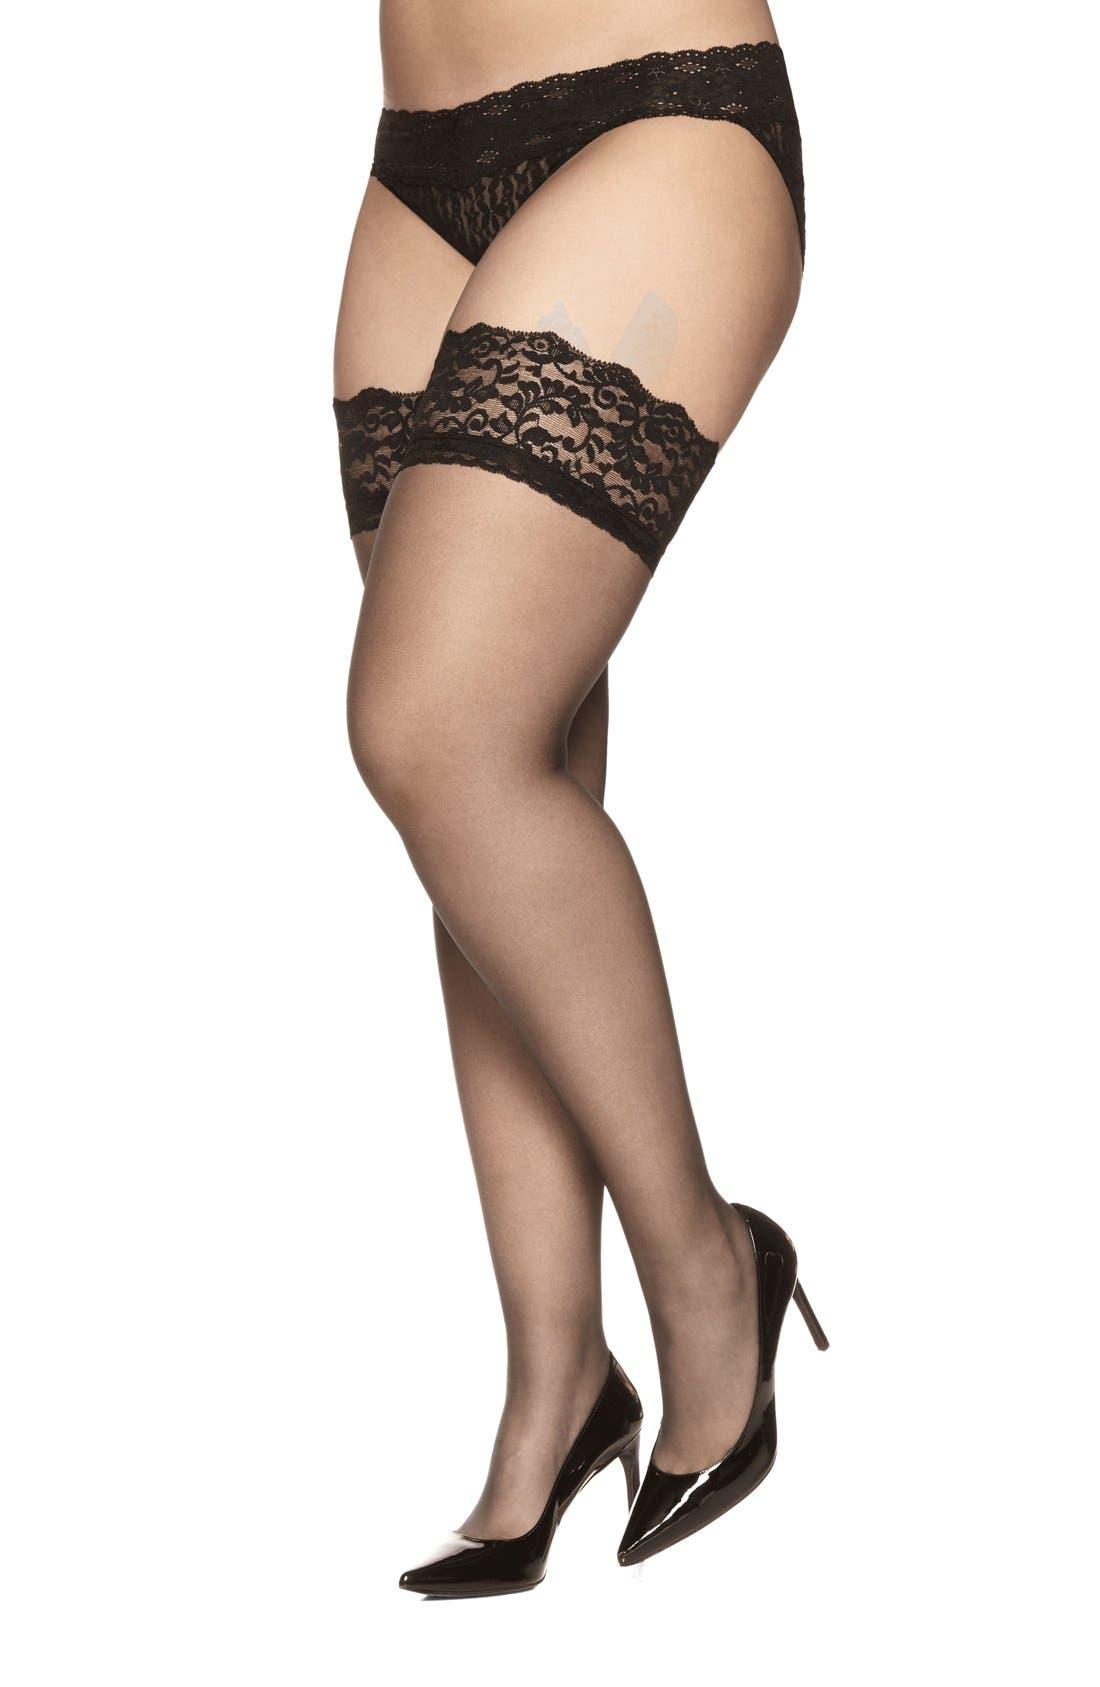 Main Image - Berkshire Stay-Up Stockings